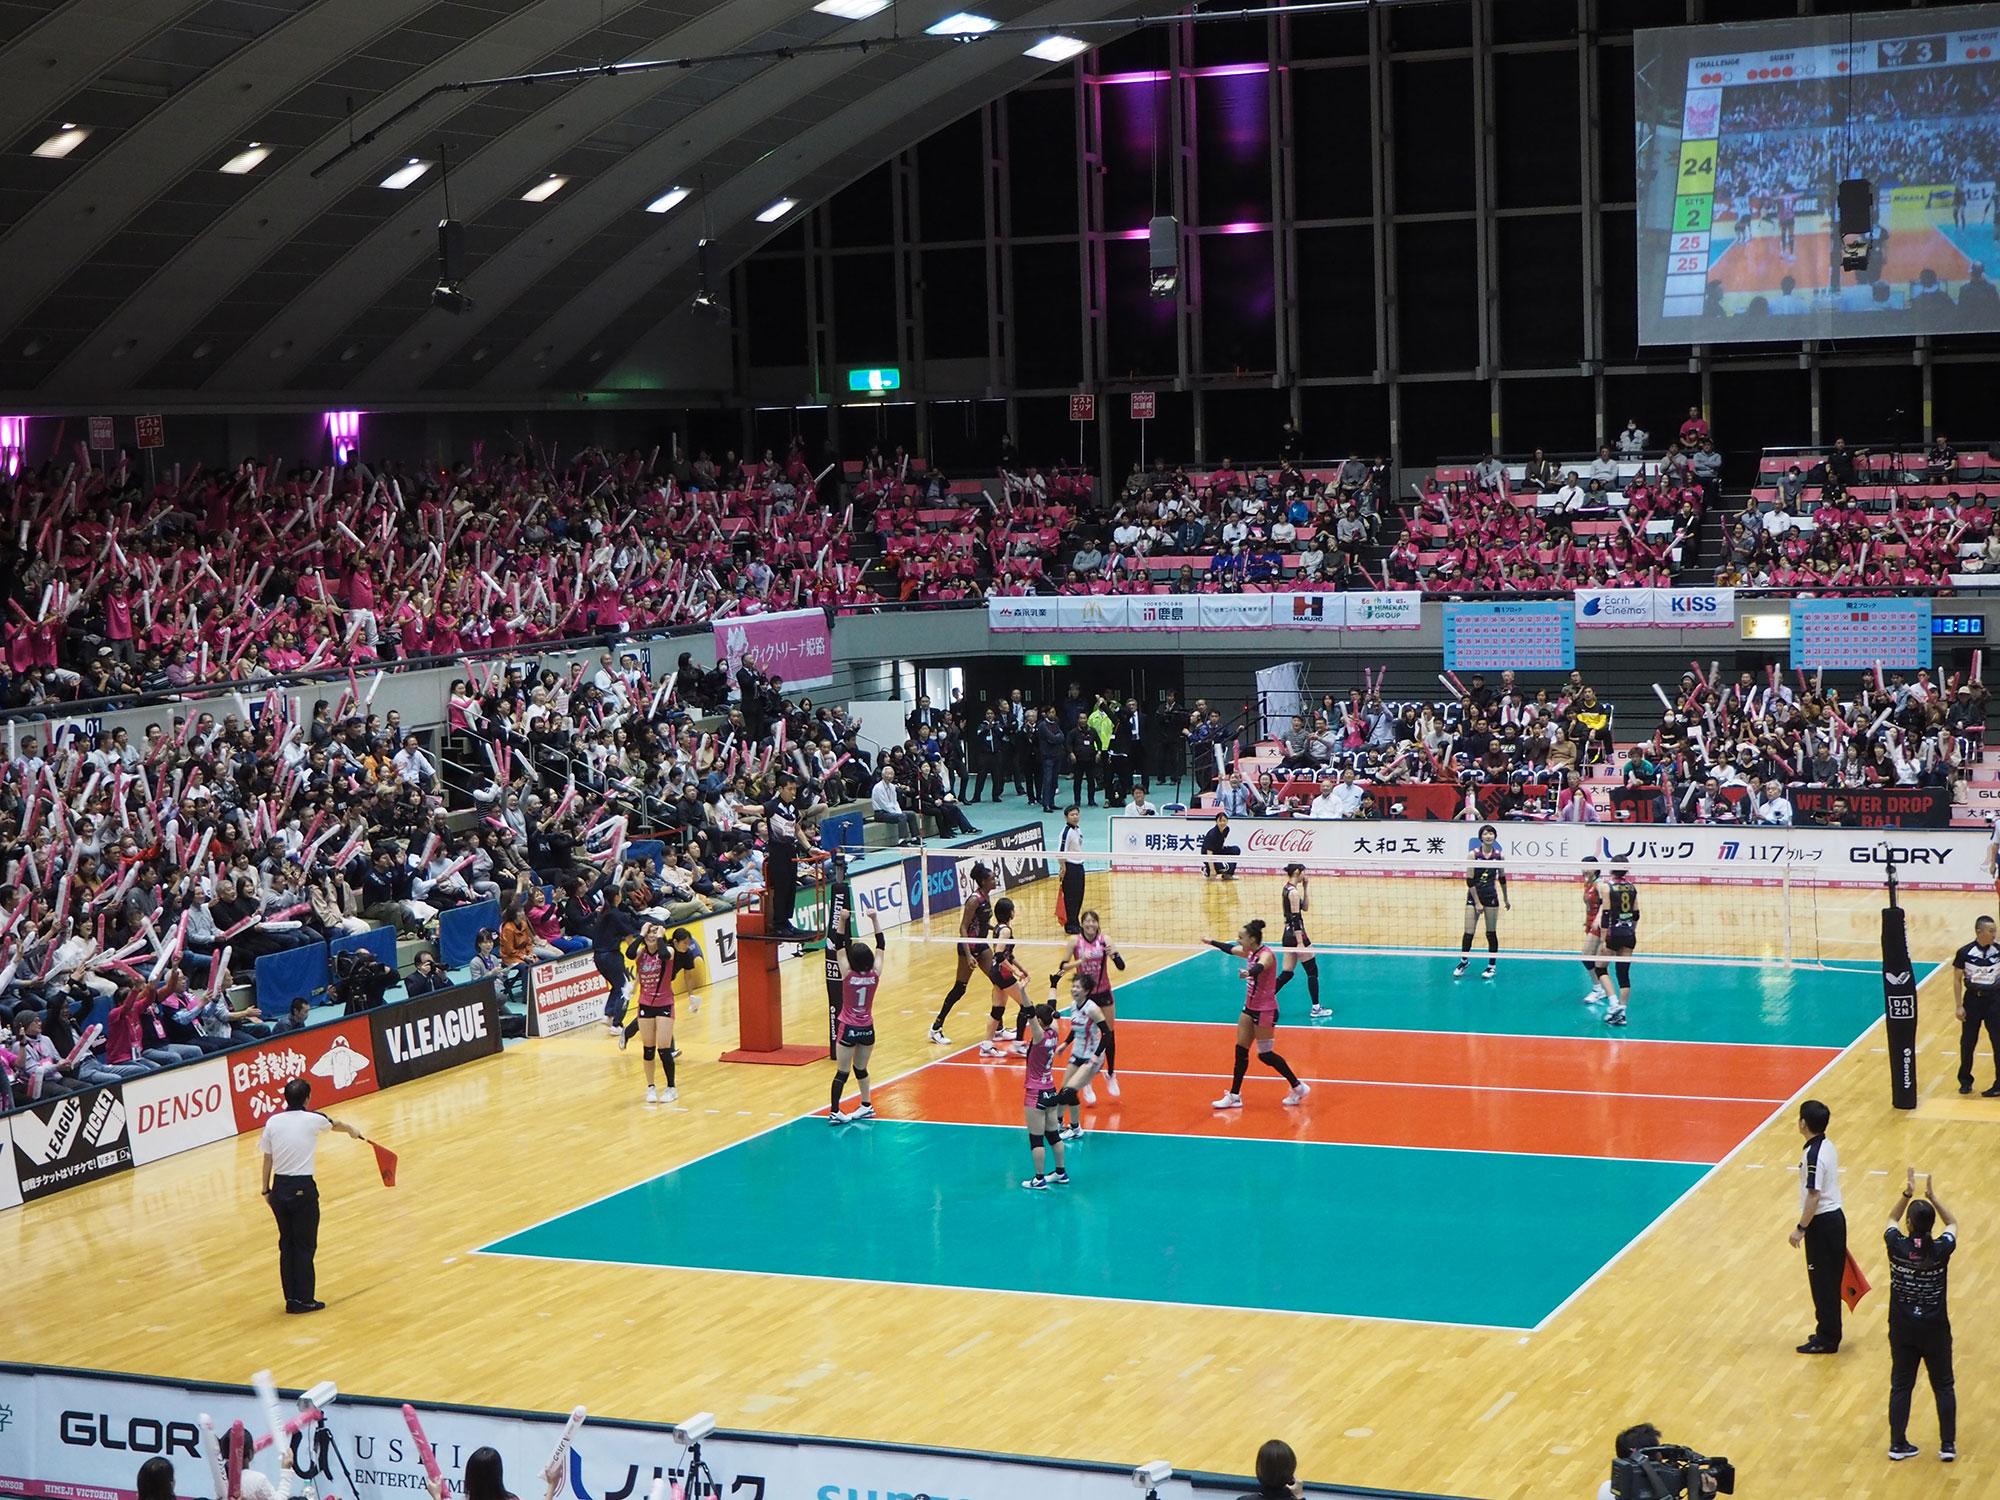 20191116 vs久光製薬 ウインク体育館